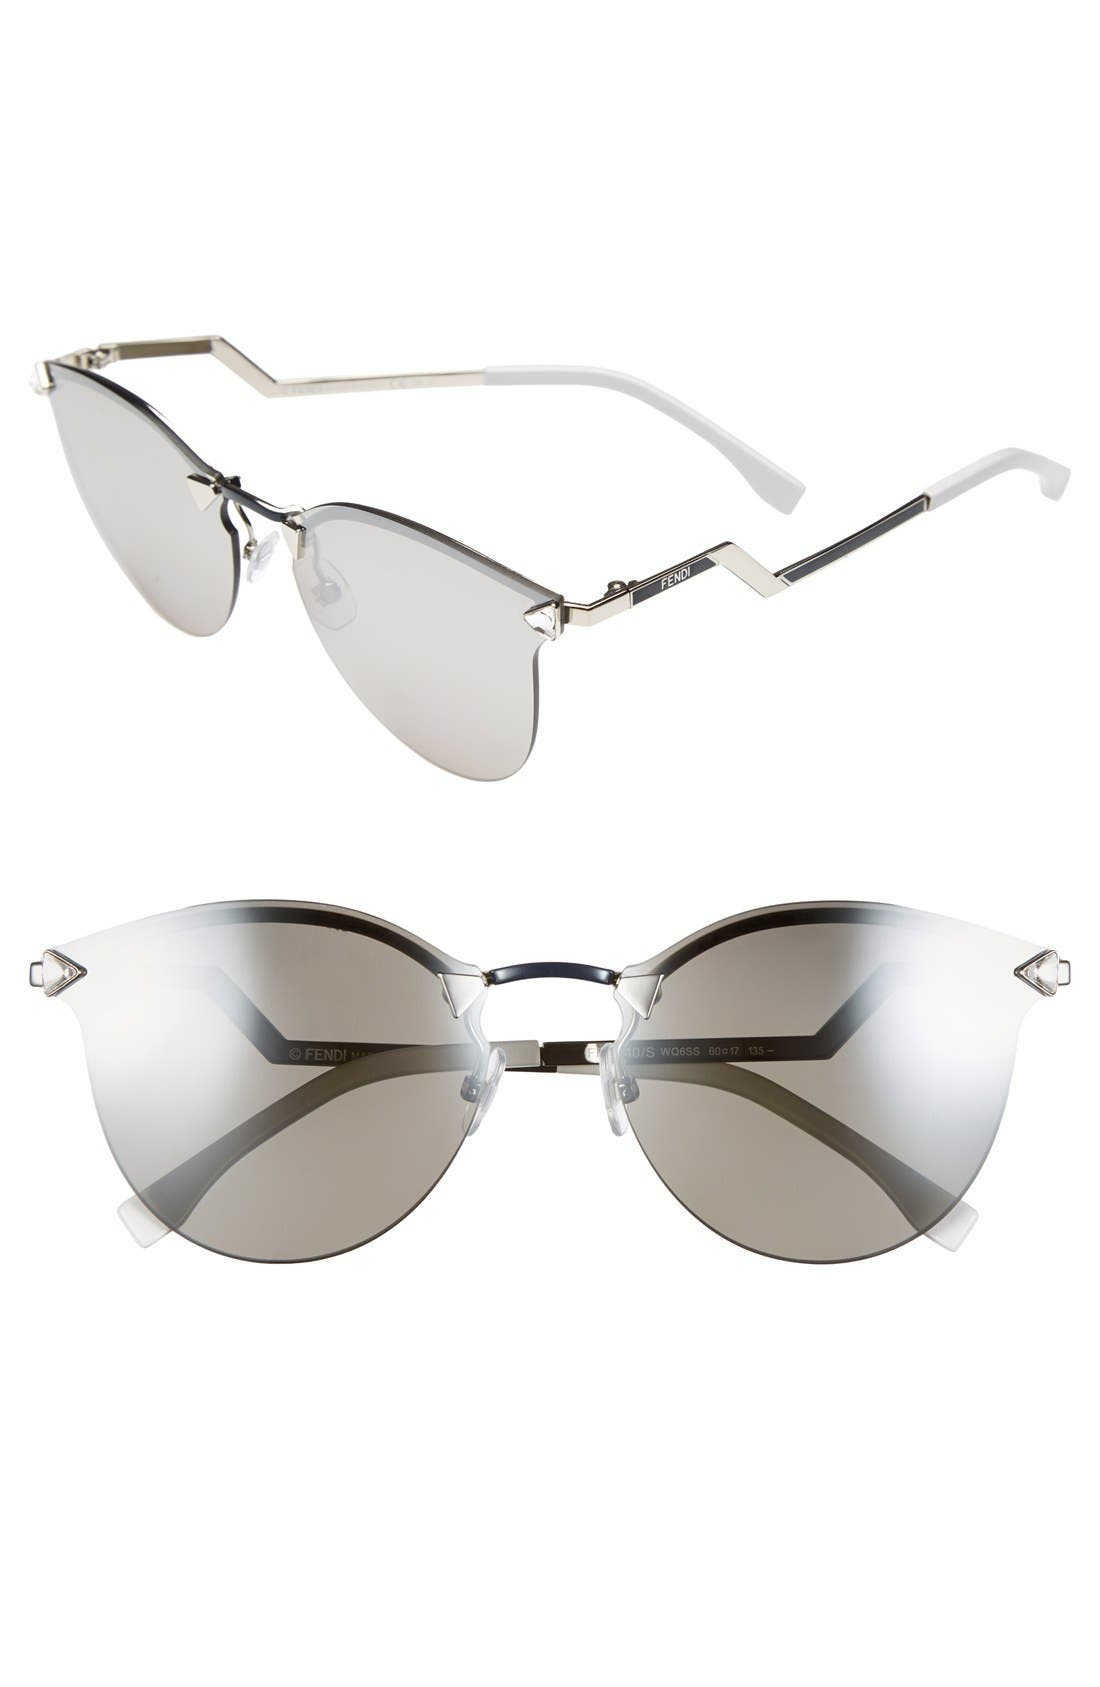 60mm Retro Sunglasses,                             Main thumbnail 1, color,                             Palladium/ Silver Mirror